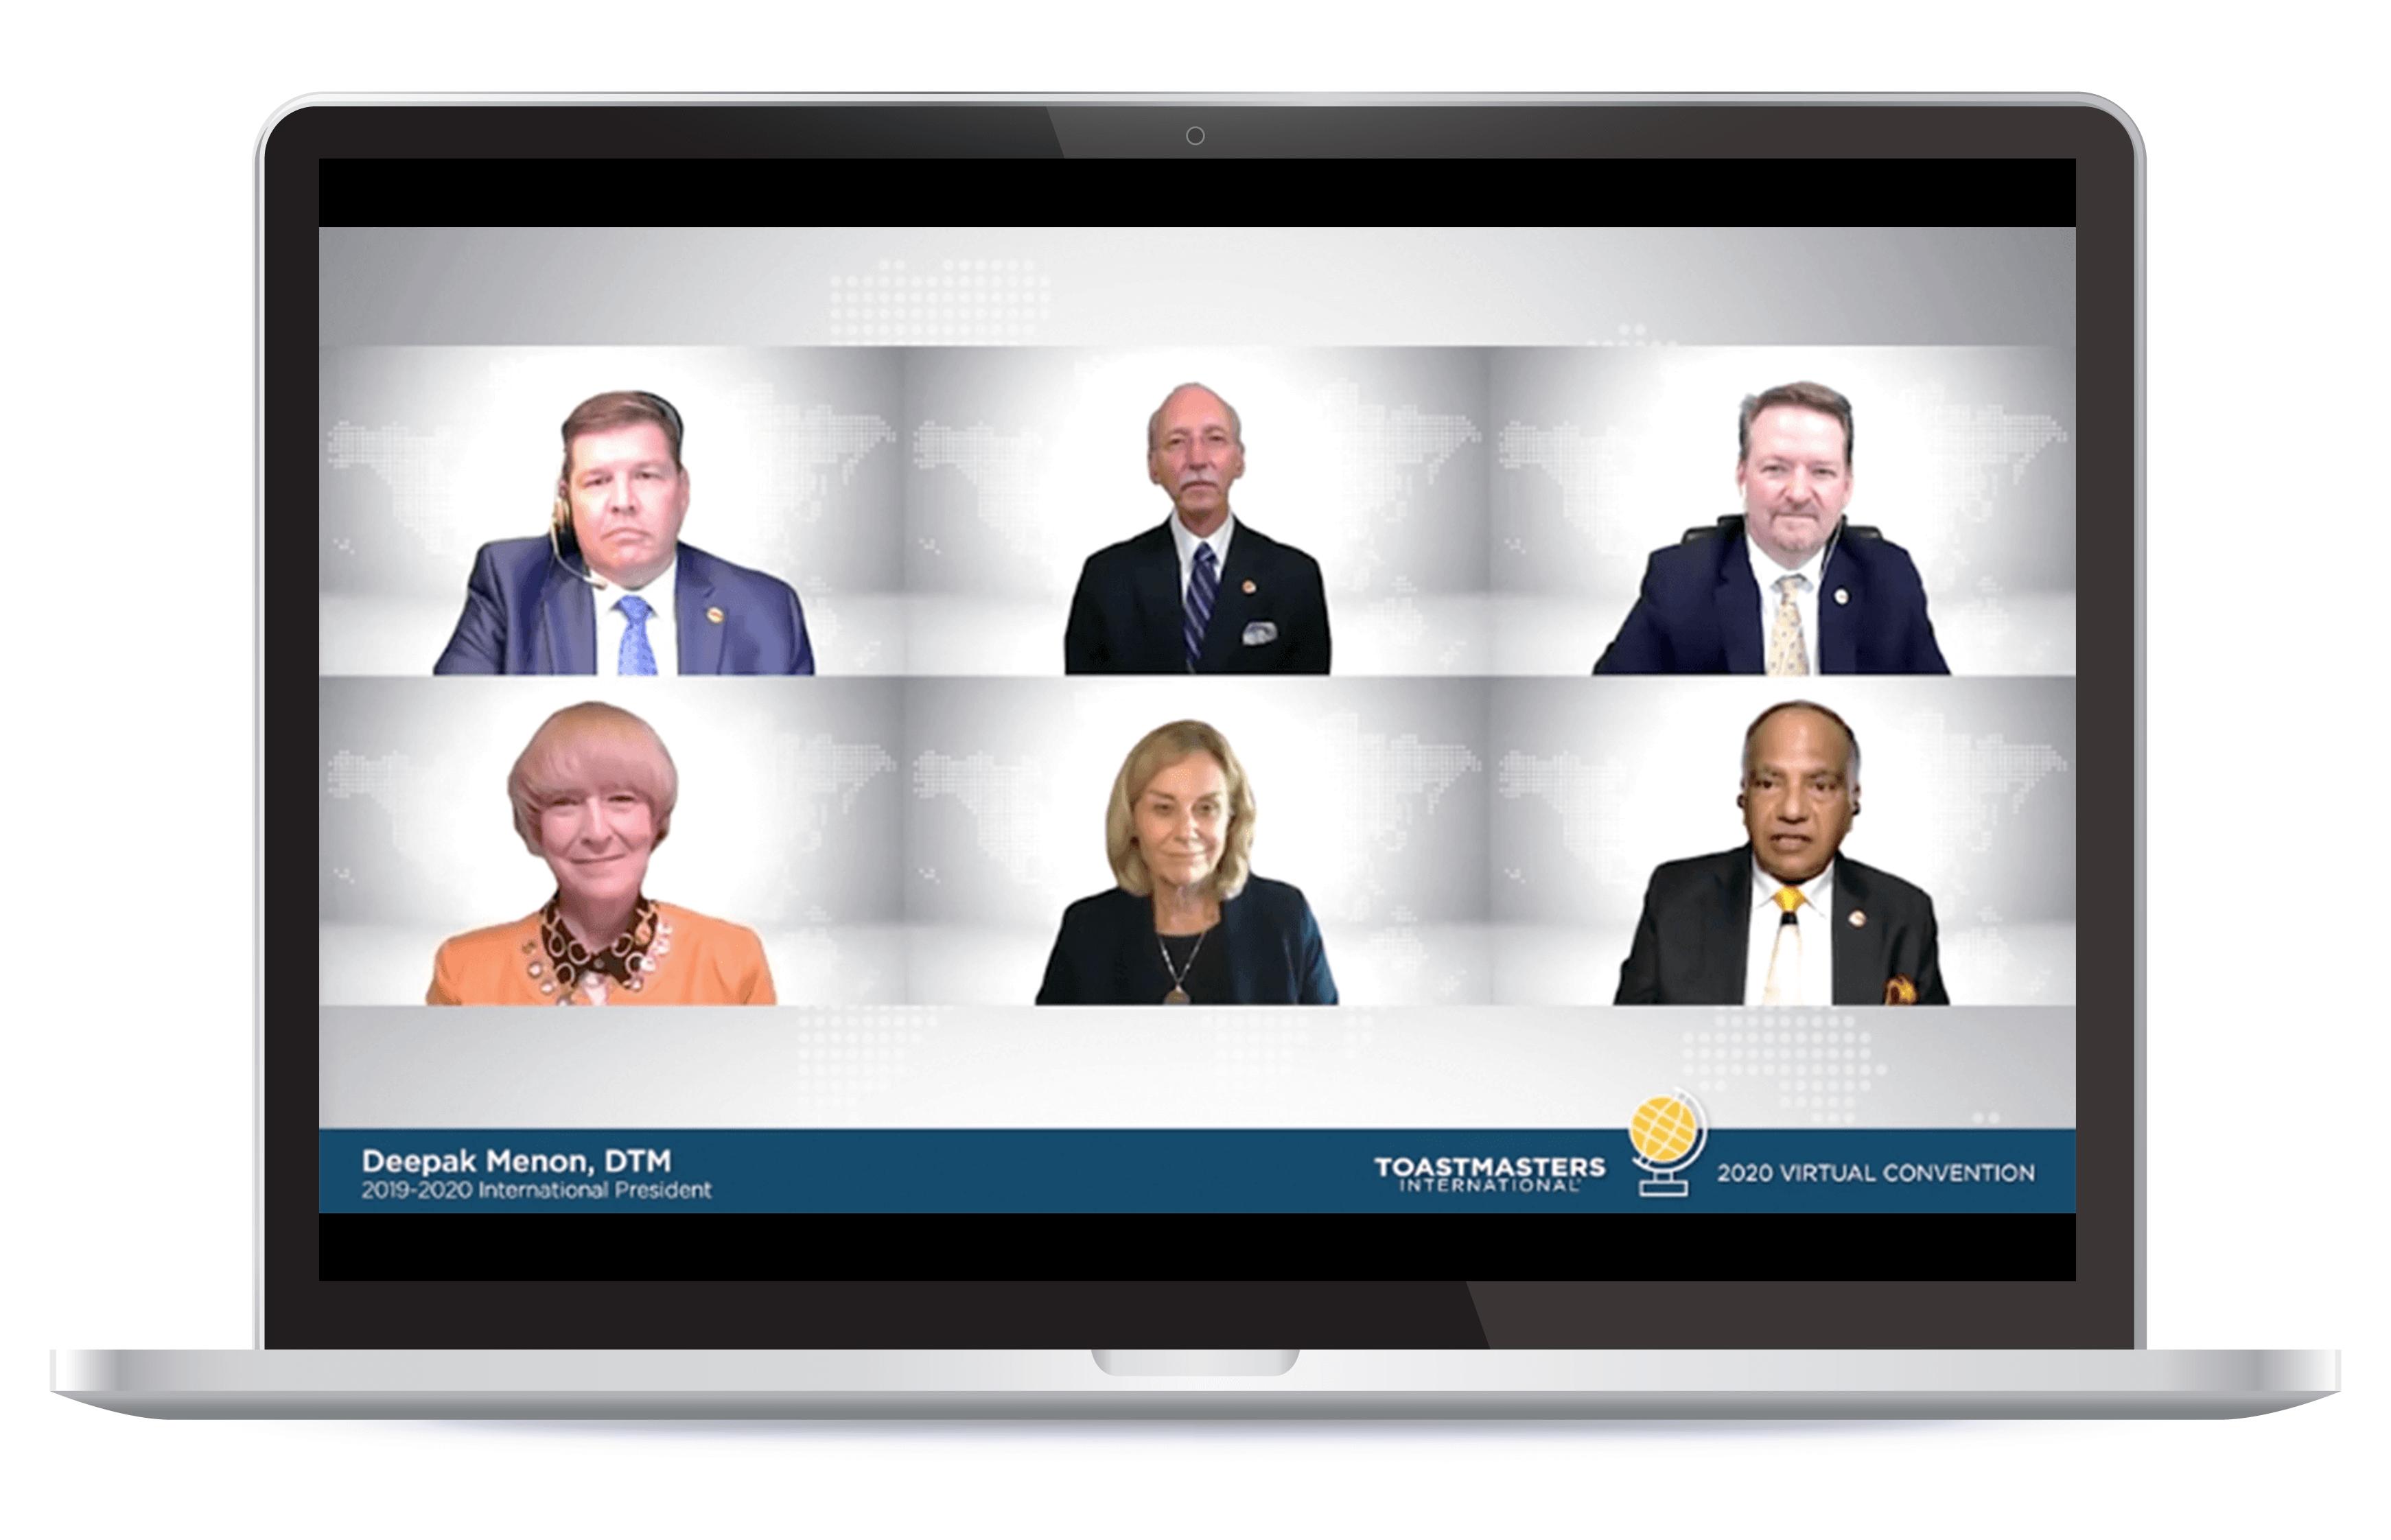 Six members of the Toastmasters International Executive Committee meeting on Zoom